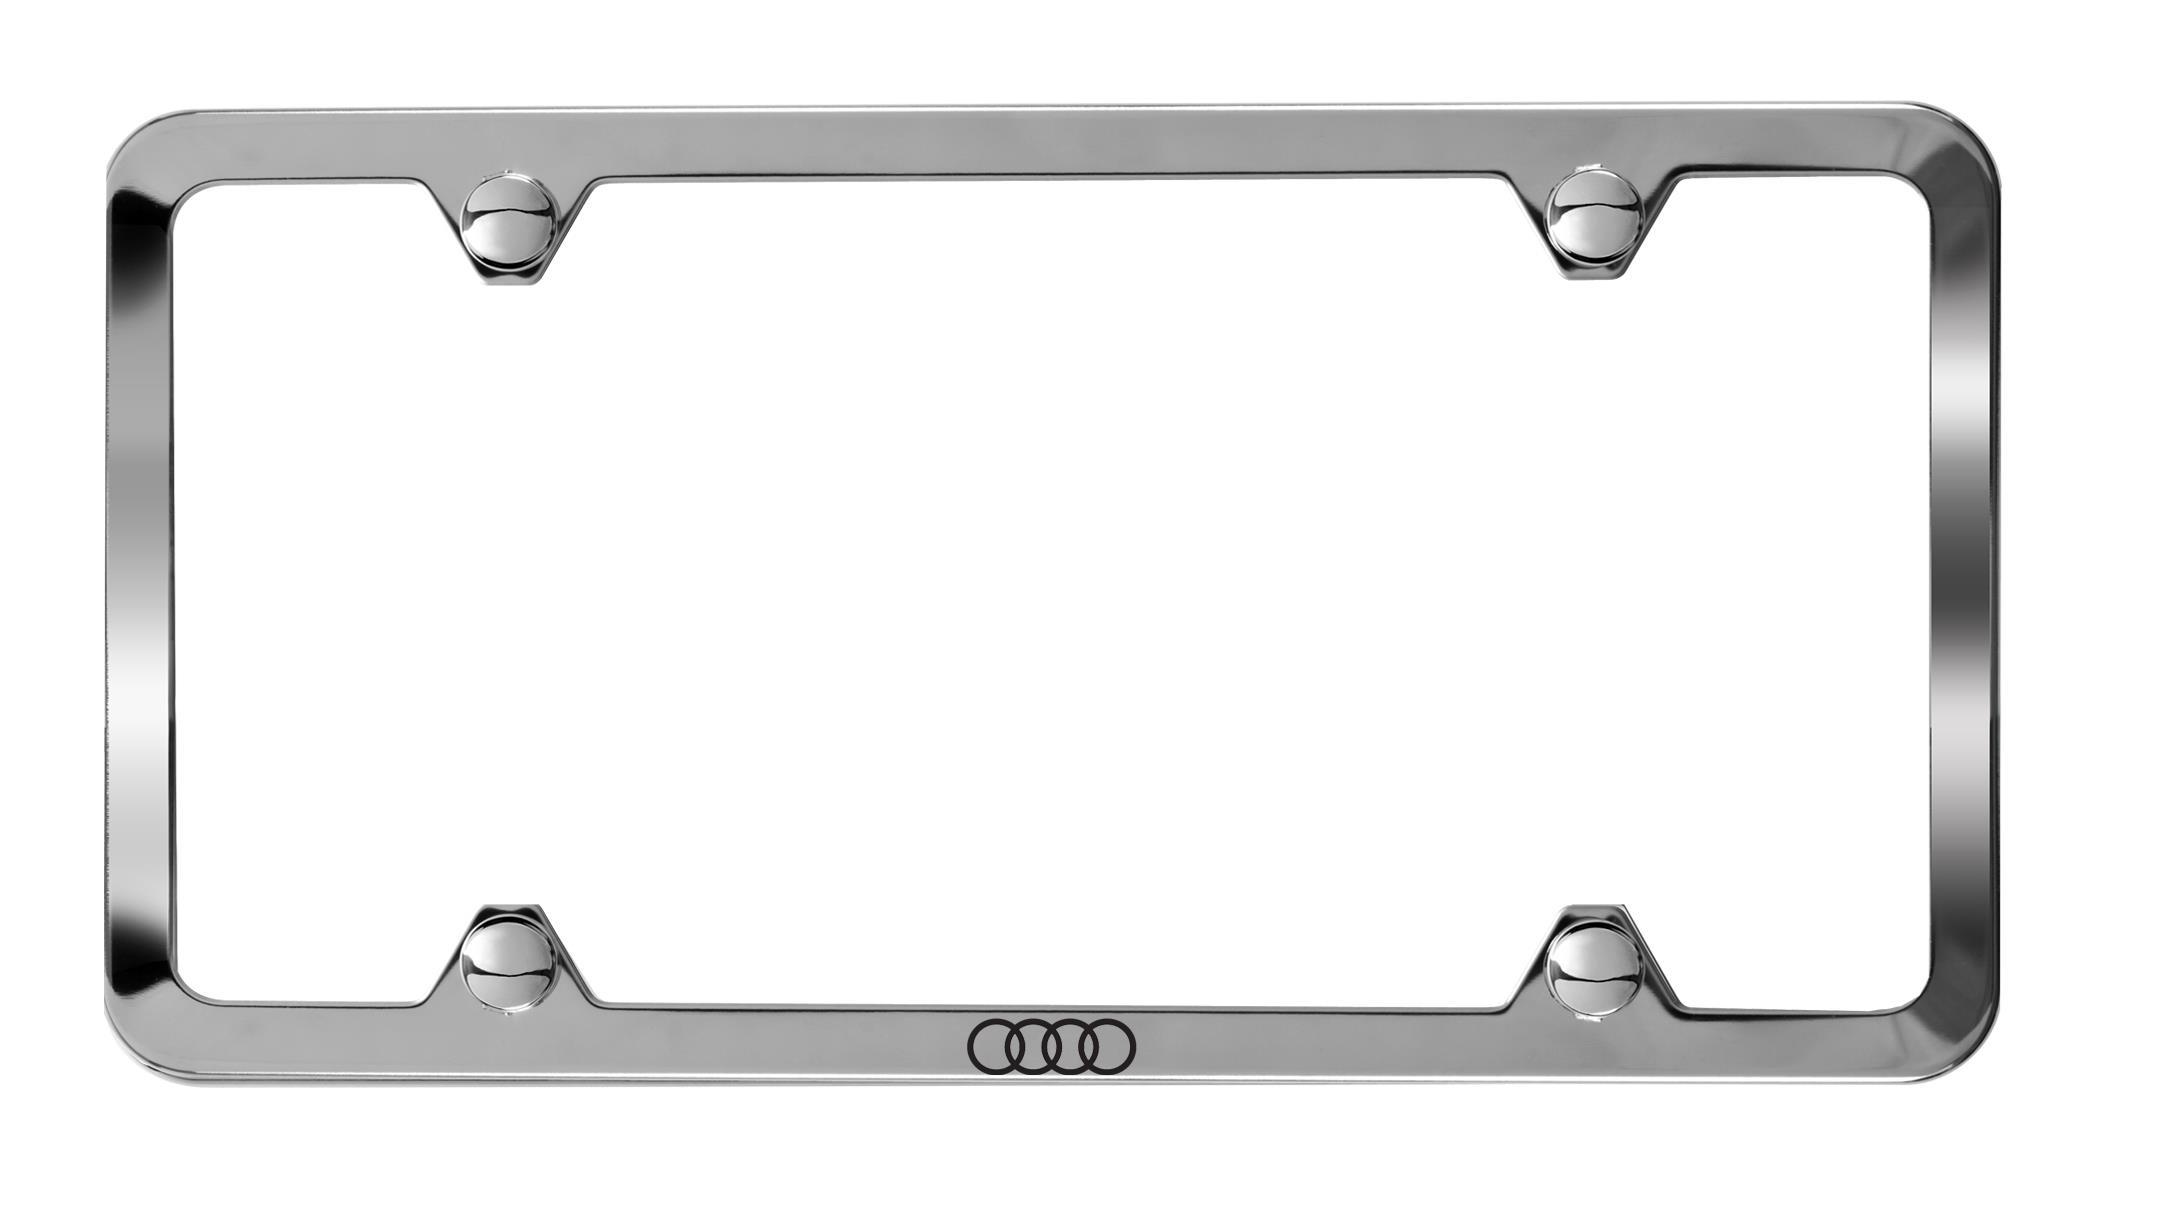 AUDI Genuine OEM License Plate Frame Stainless Steel 8K0-071-801-DX9